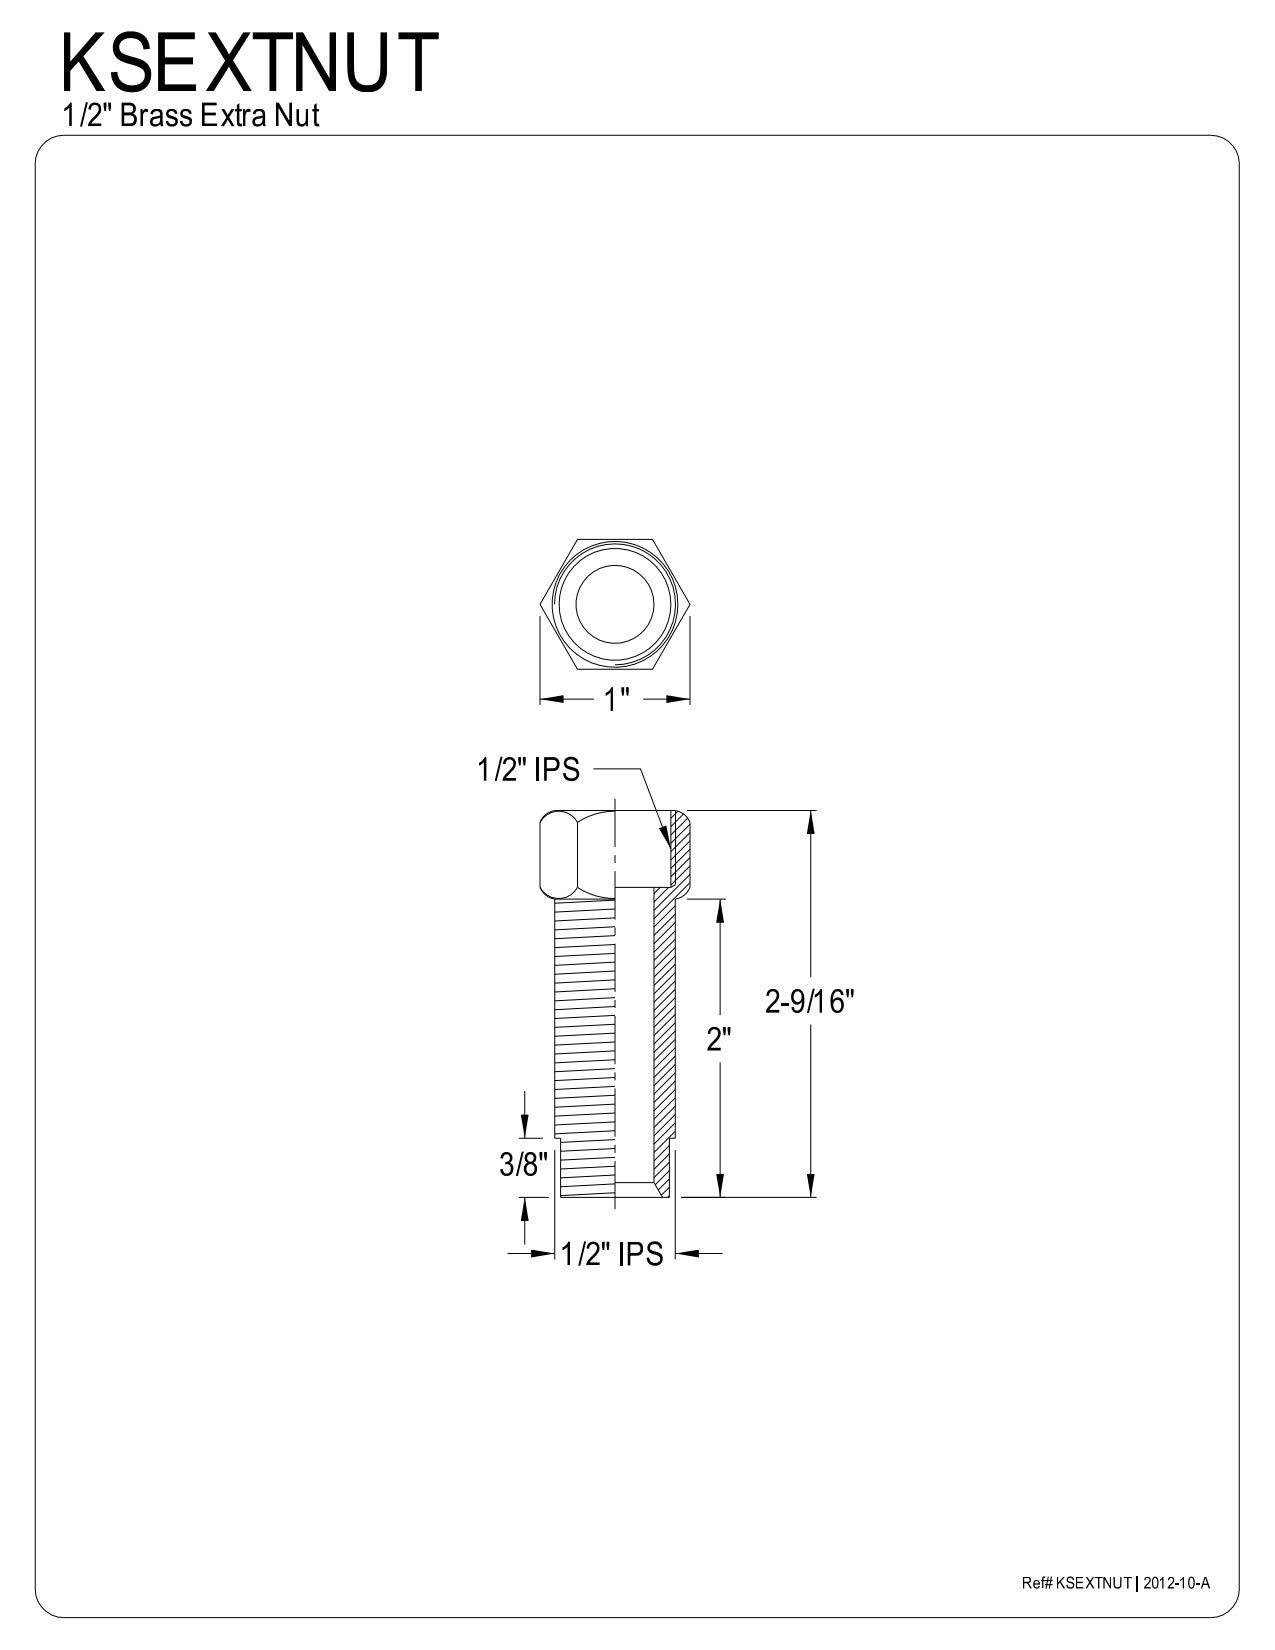 Kingston Brass KSEXTNUT Brass Extension Nut 1/2-Inch Shank